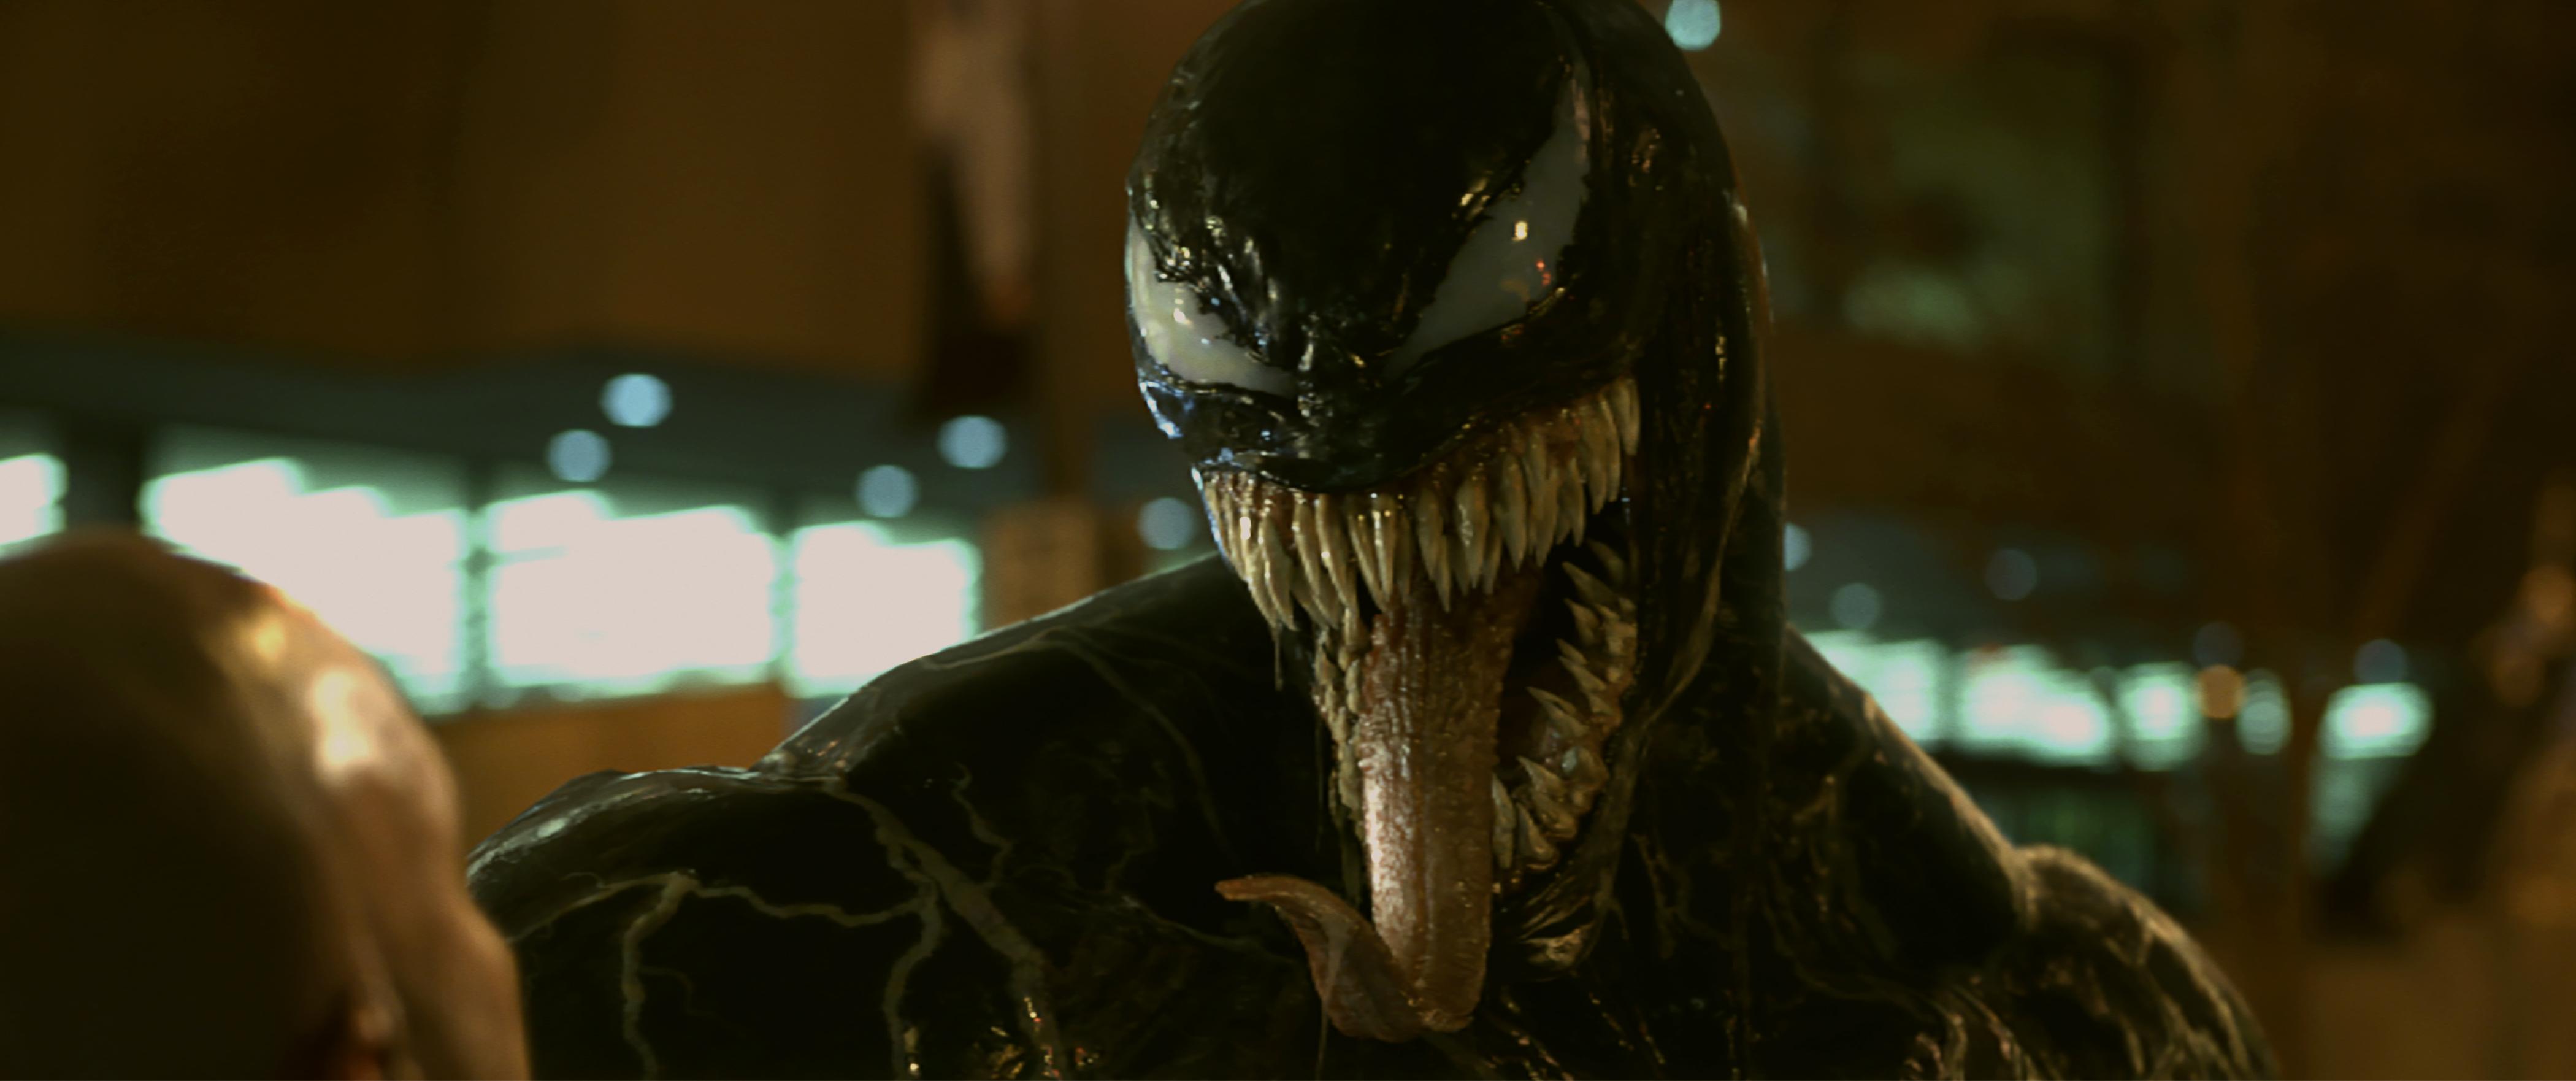 [VENOM] - Estreou! Spoilers liberados - Página 2 Venom_-_First_Look_Image_%281%29